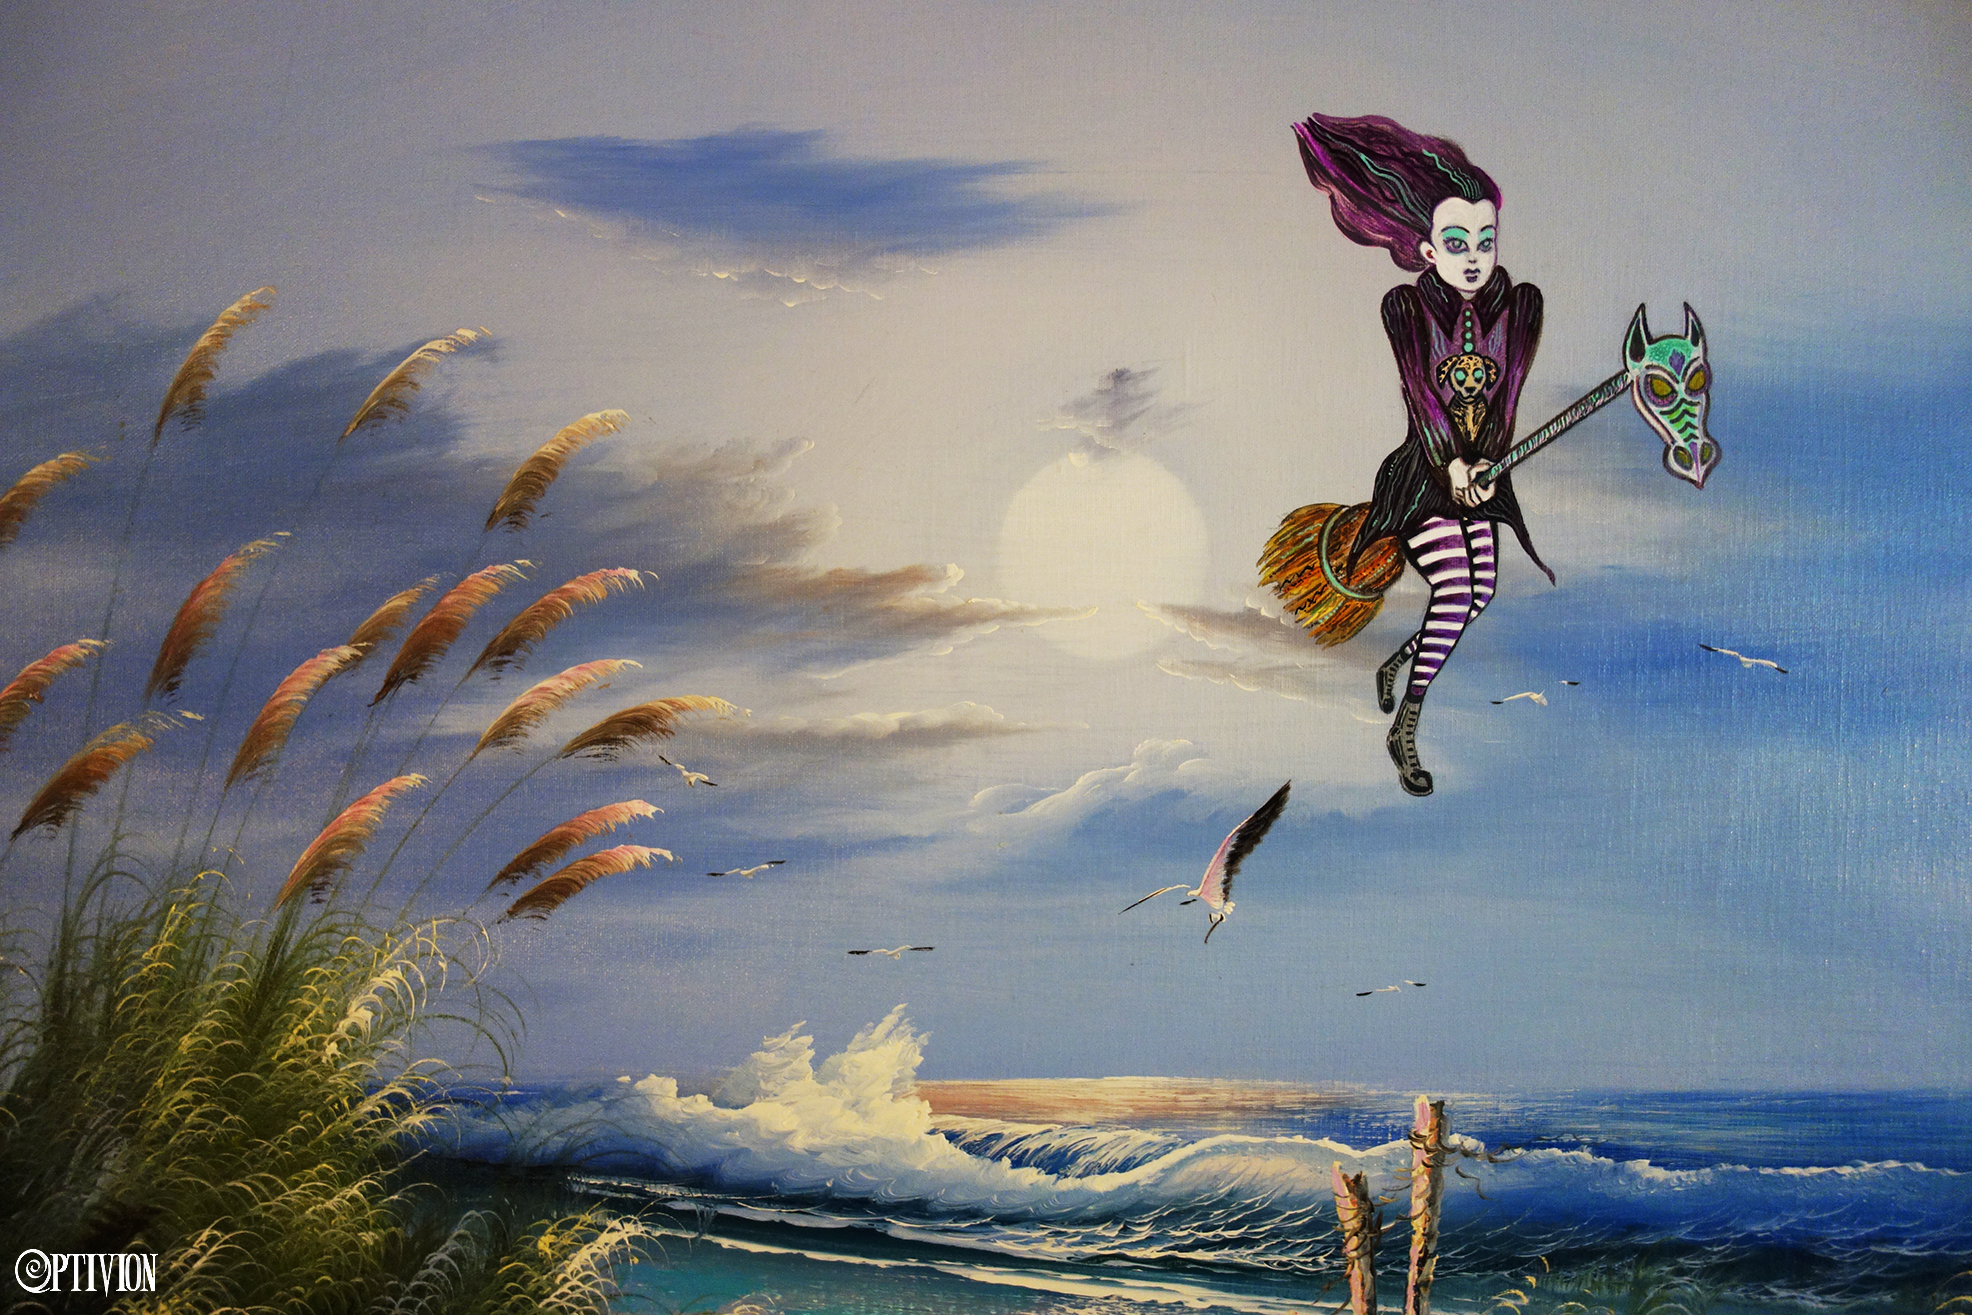 OptivioN - My gothic Beach painting